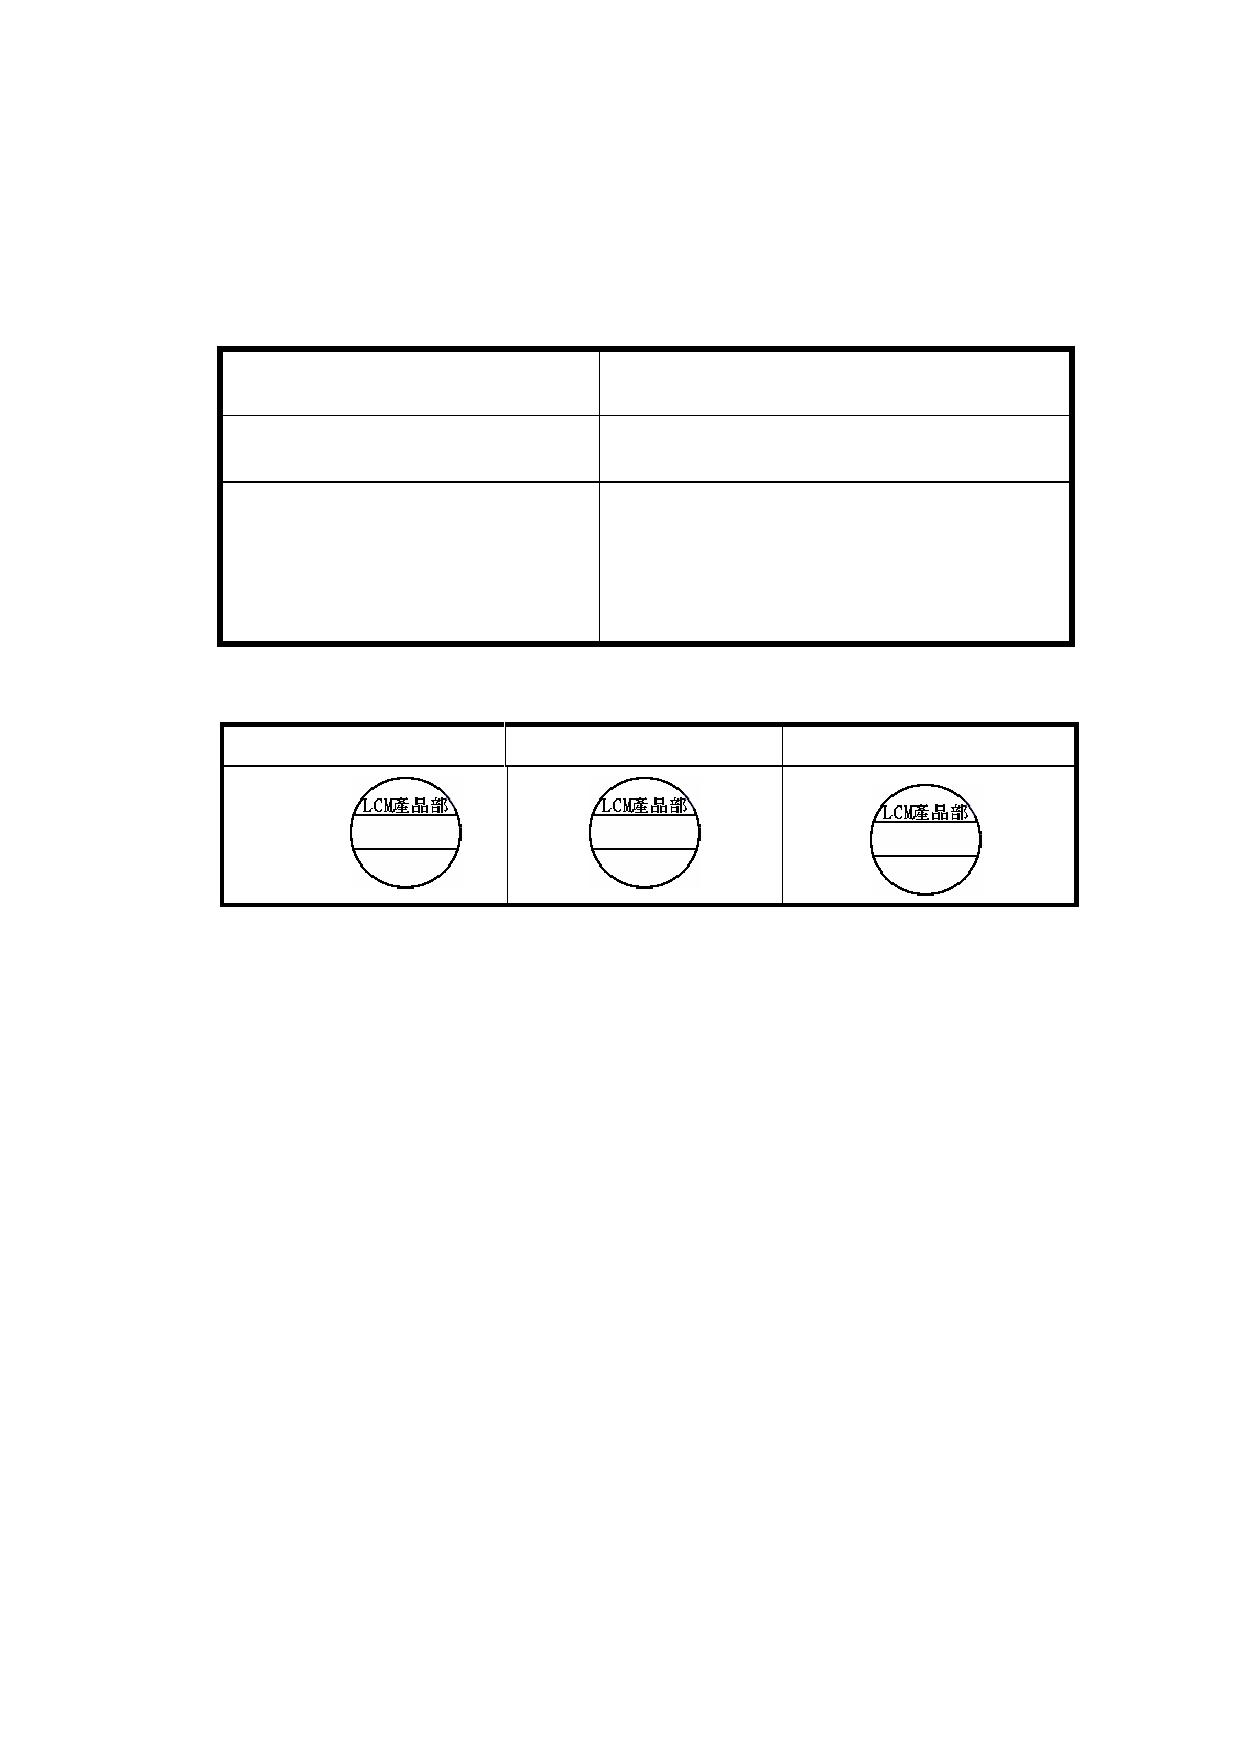 I1813-6IPN1216A دیتاشیت PDF